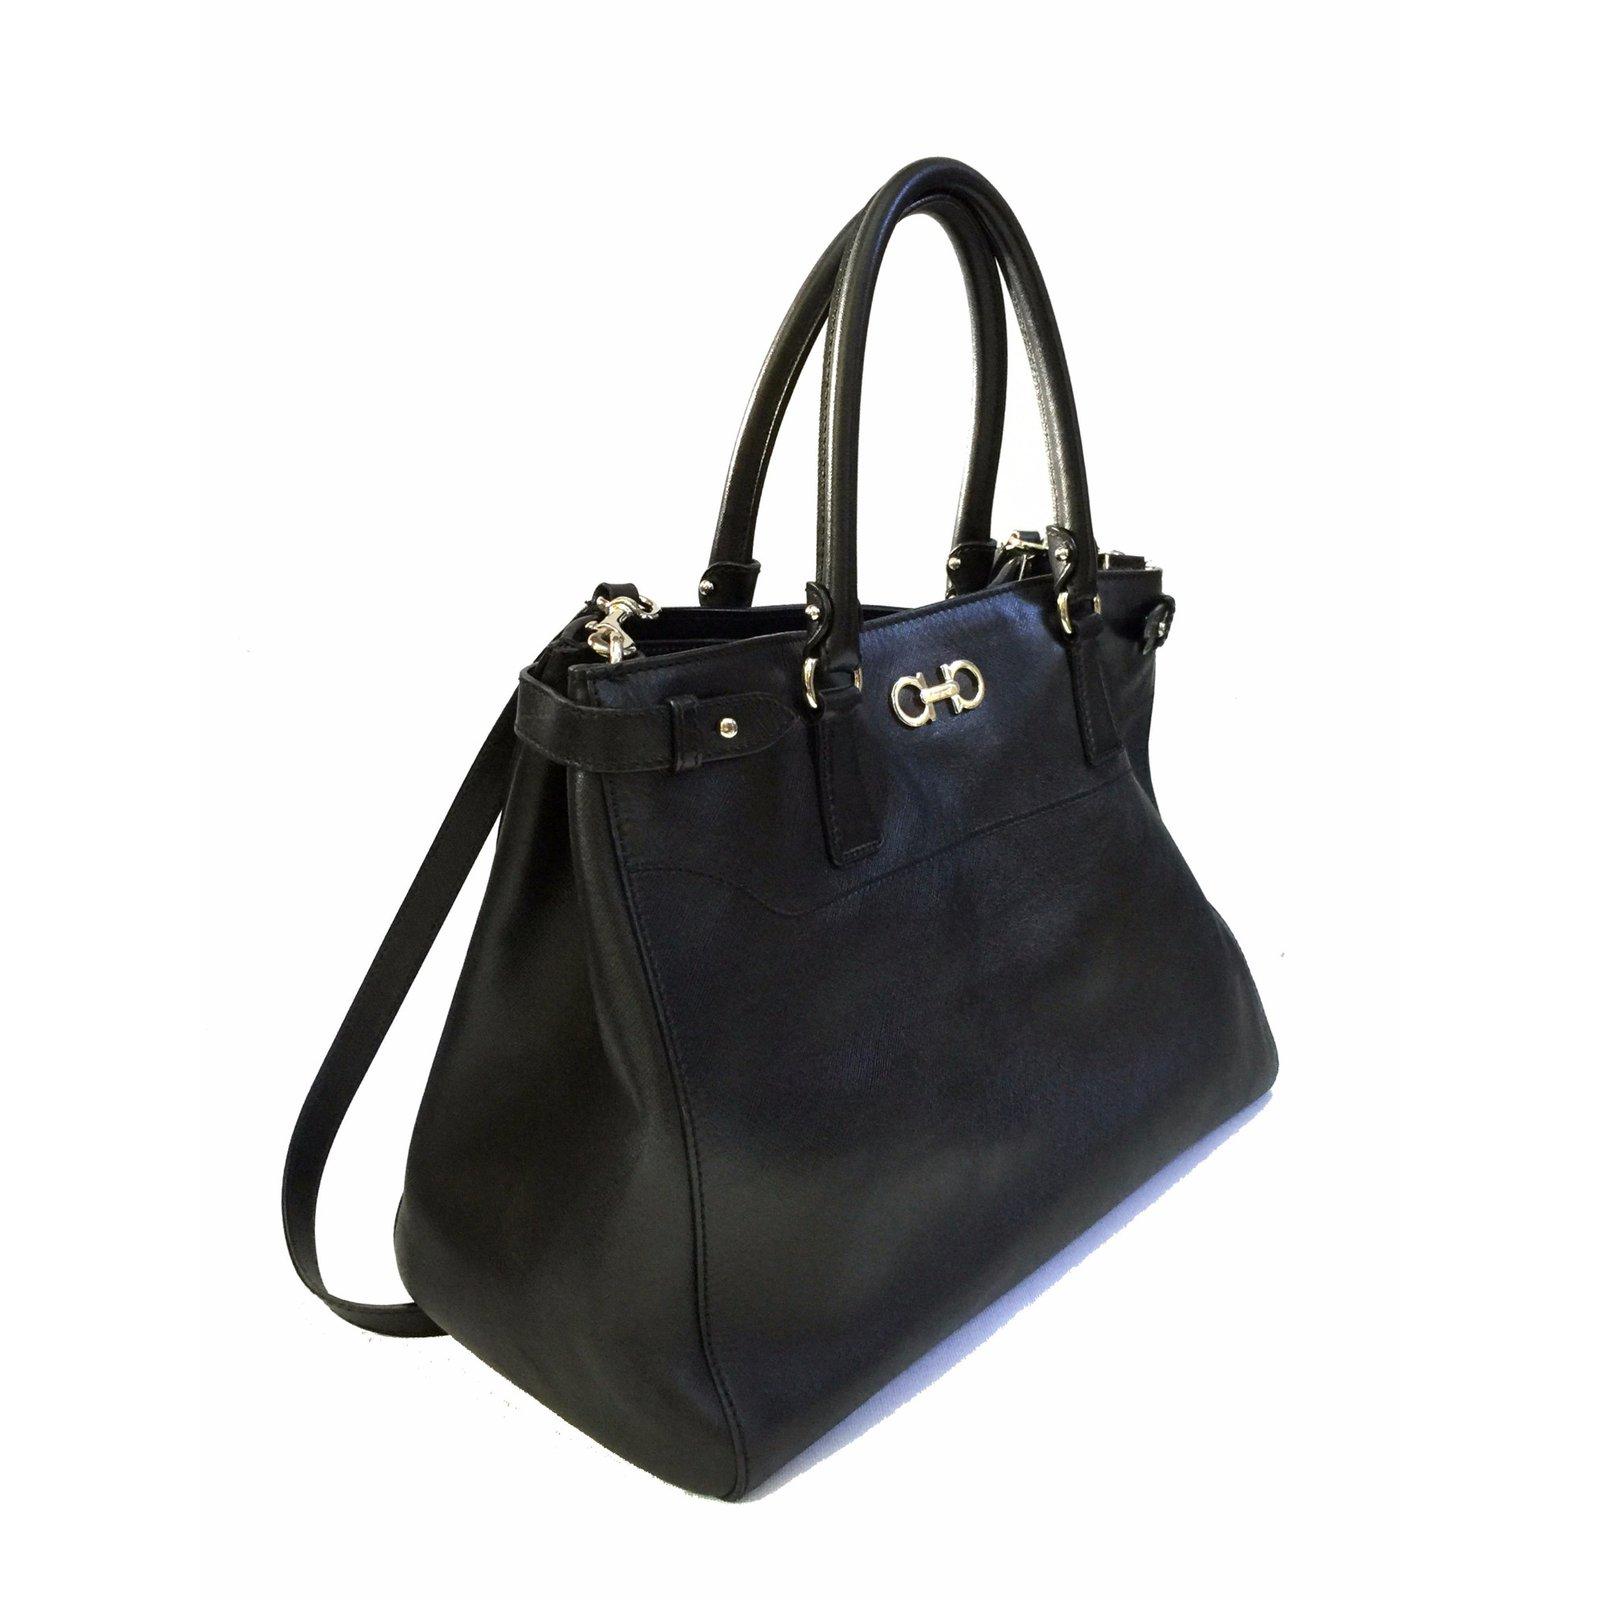 Salvatore Ferragamo Batik Saffiano Tote (Large) Handbags Leather Black  ref.57152 6af79eb204e75